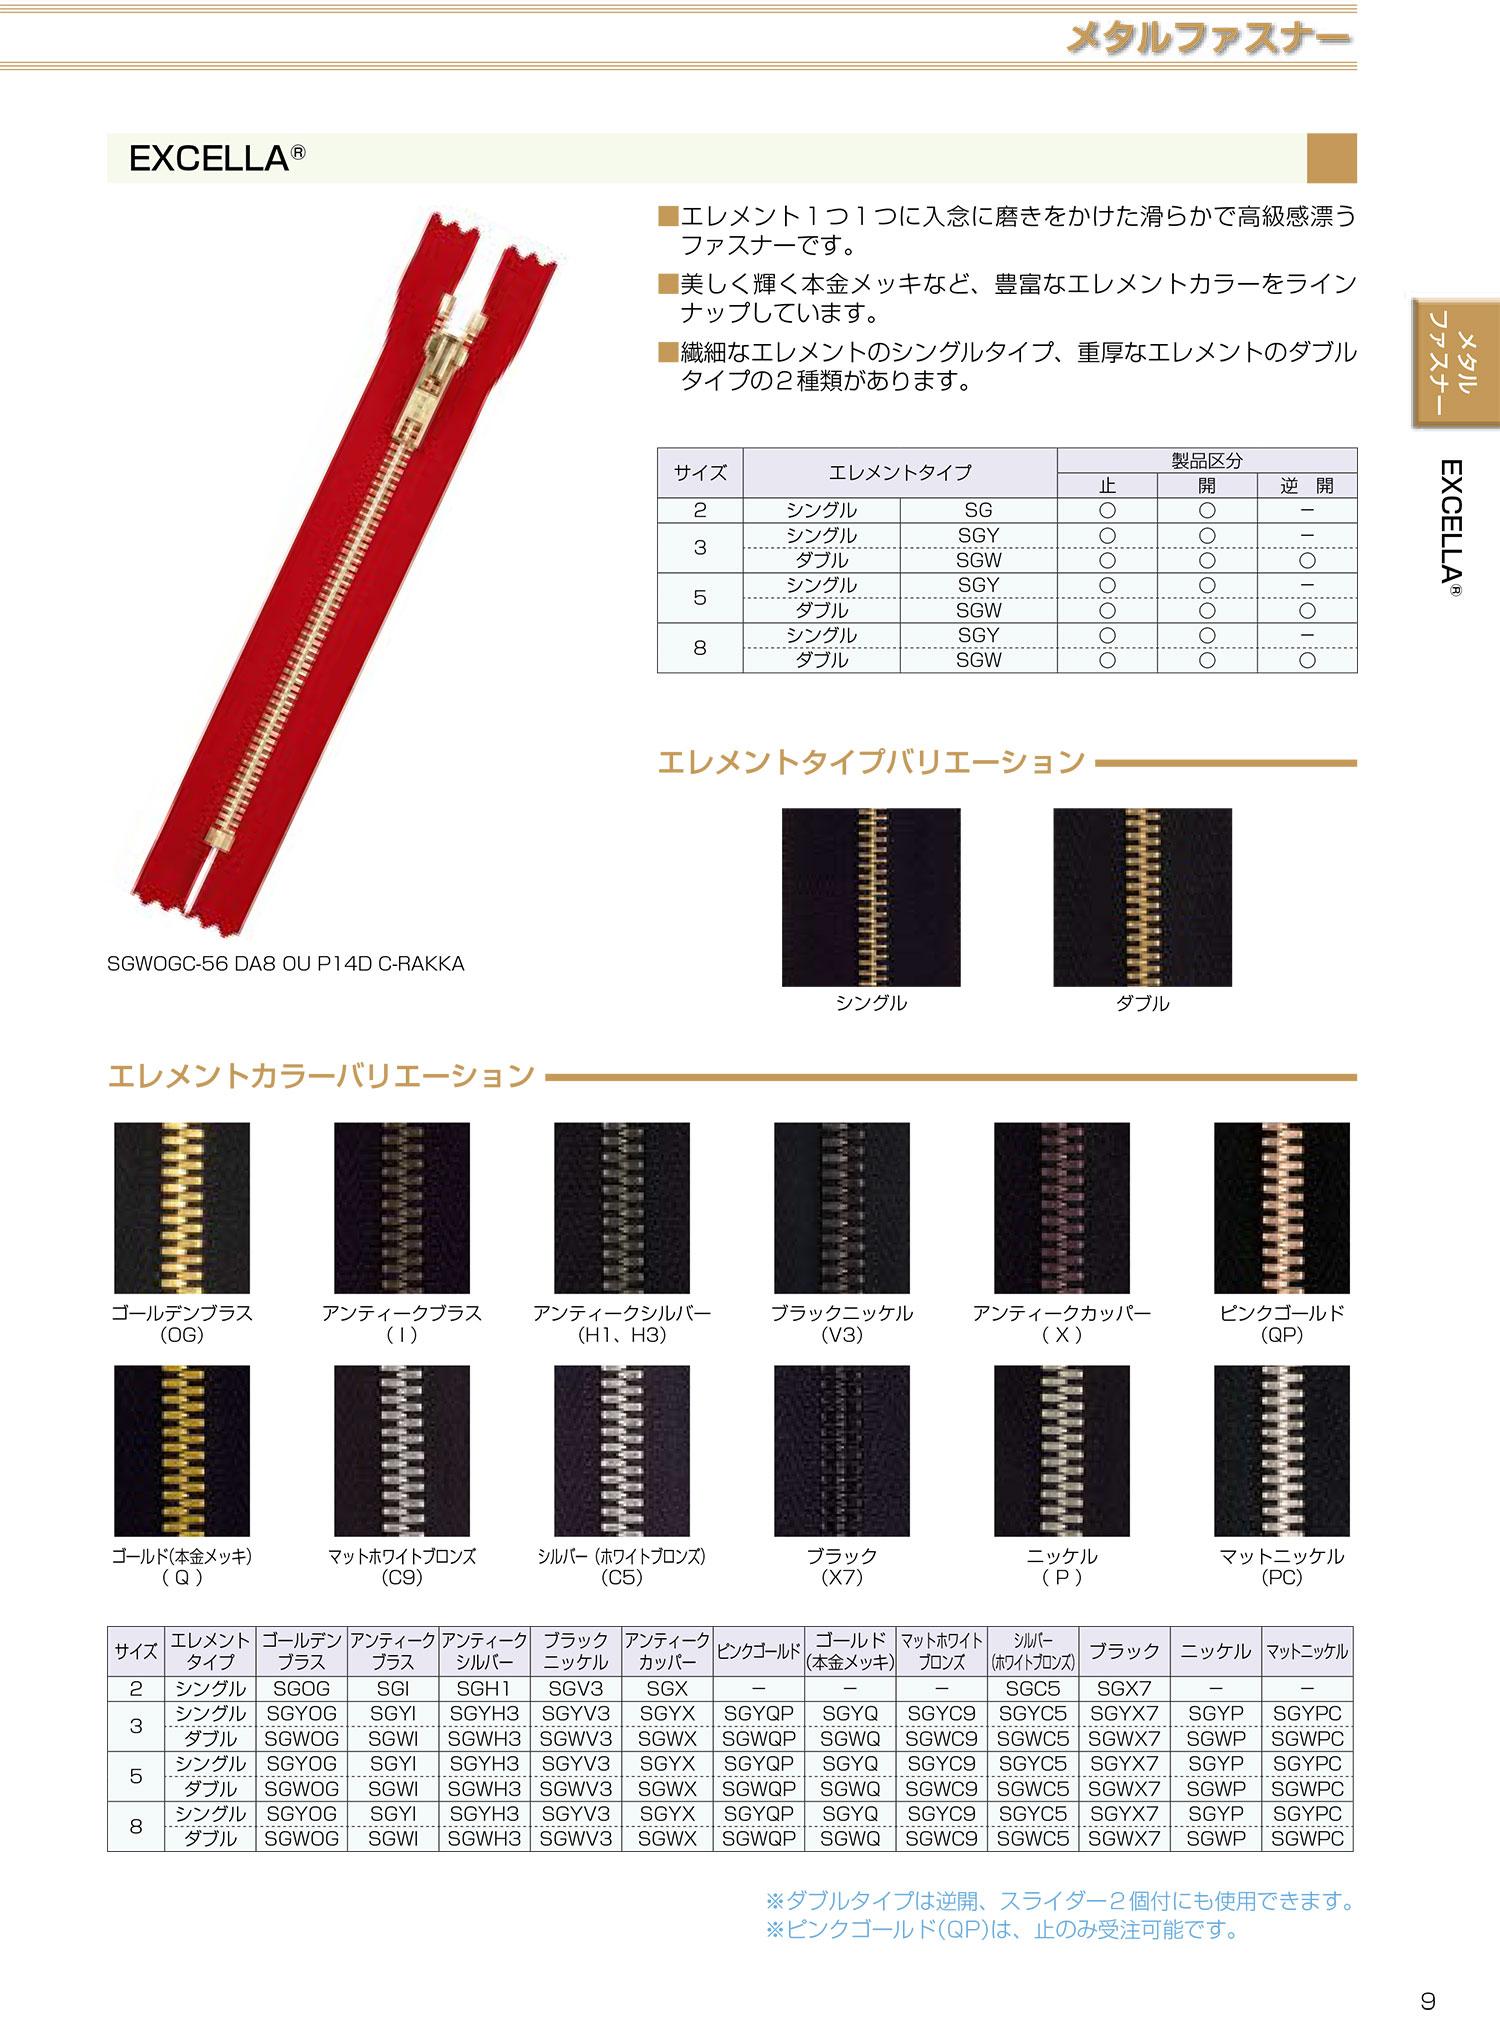 8SGWPMR エクセラ 8サイズ ニッケル 逆開 ダブル[ファスナー] YKK/オークラ商事 - ApparelX アパレル資材卸通販